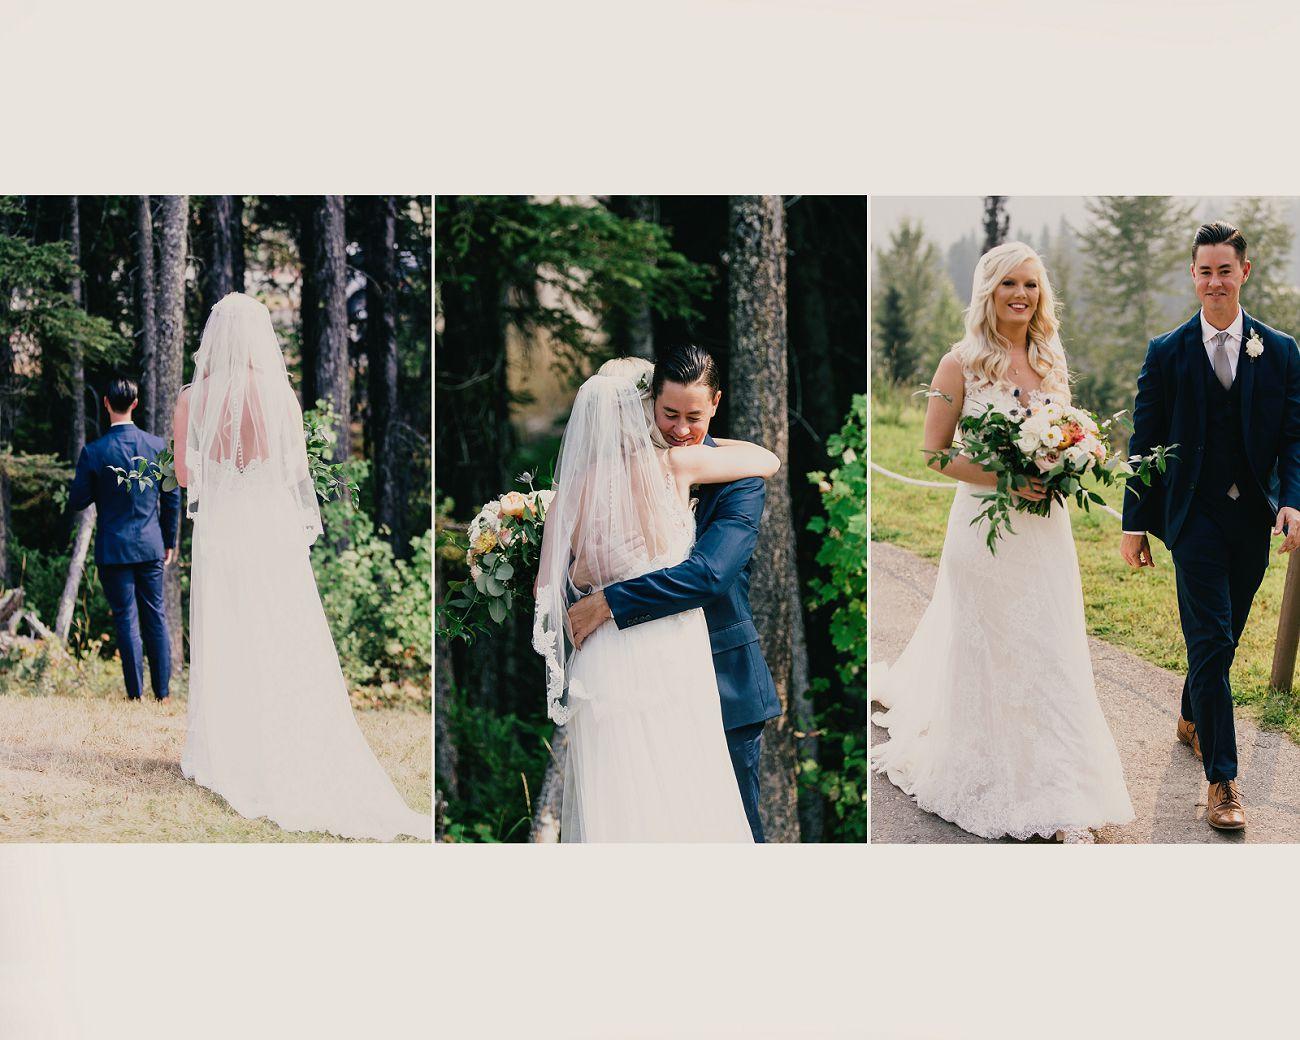 Jennifer_Mooney_Photo_Whitefish_mountain_resort_wedding_elegant_montana_wedding_006.jpg